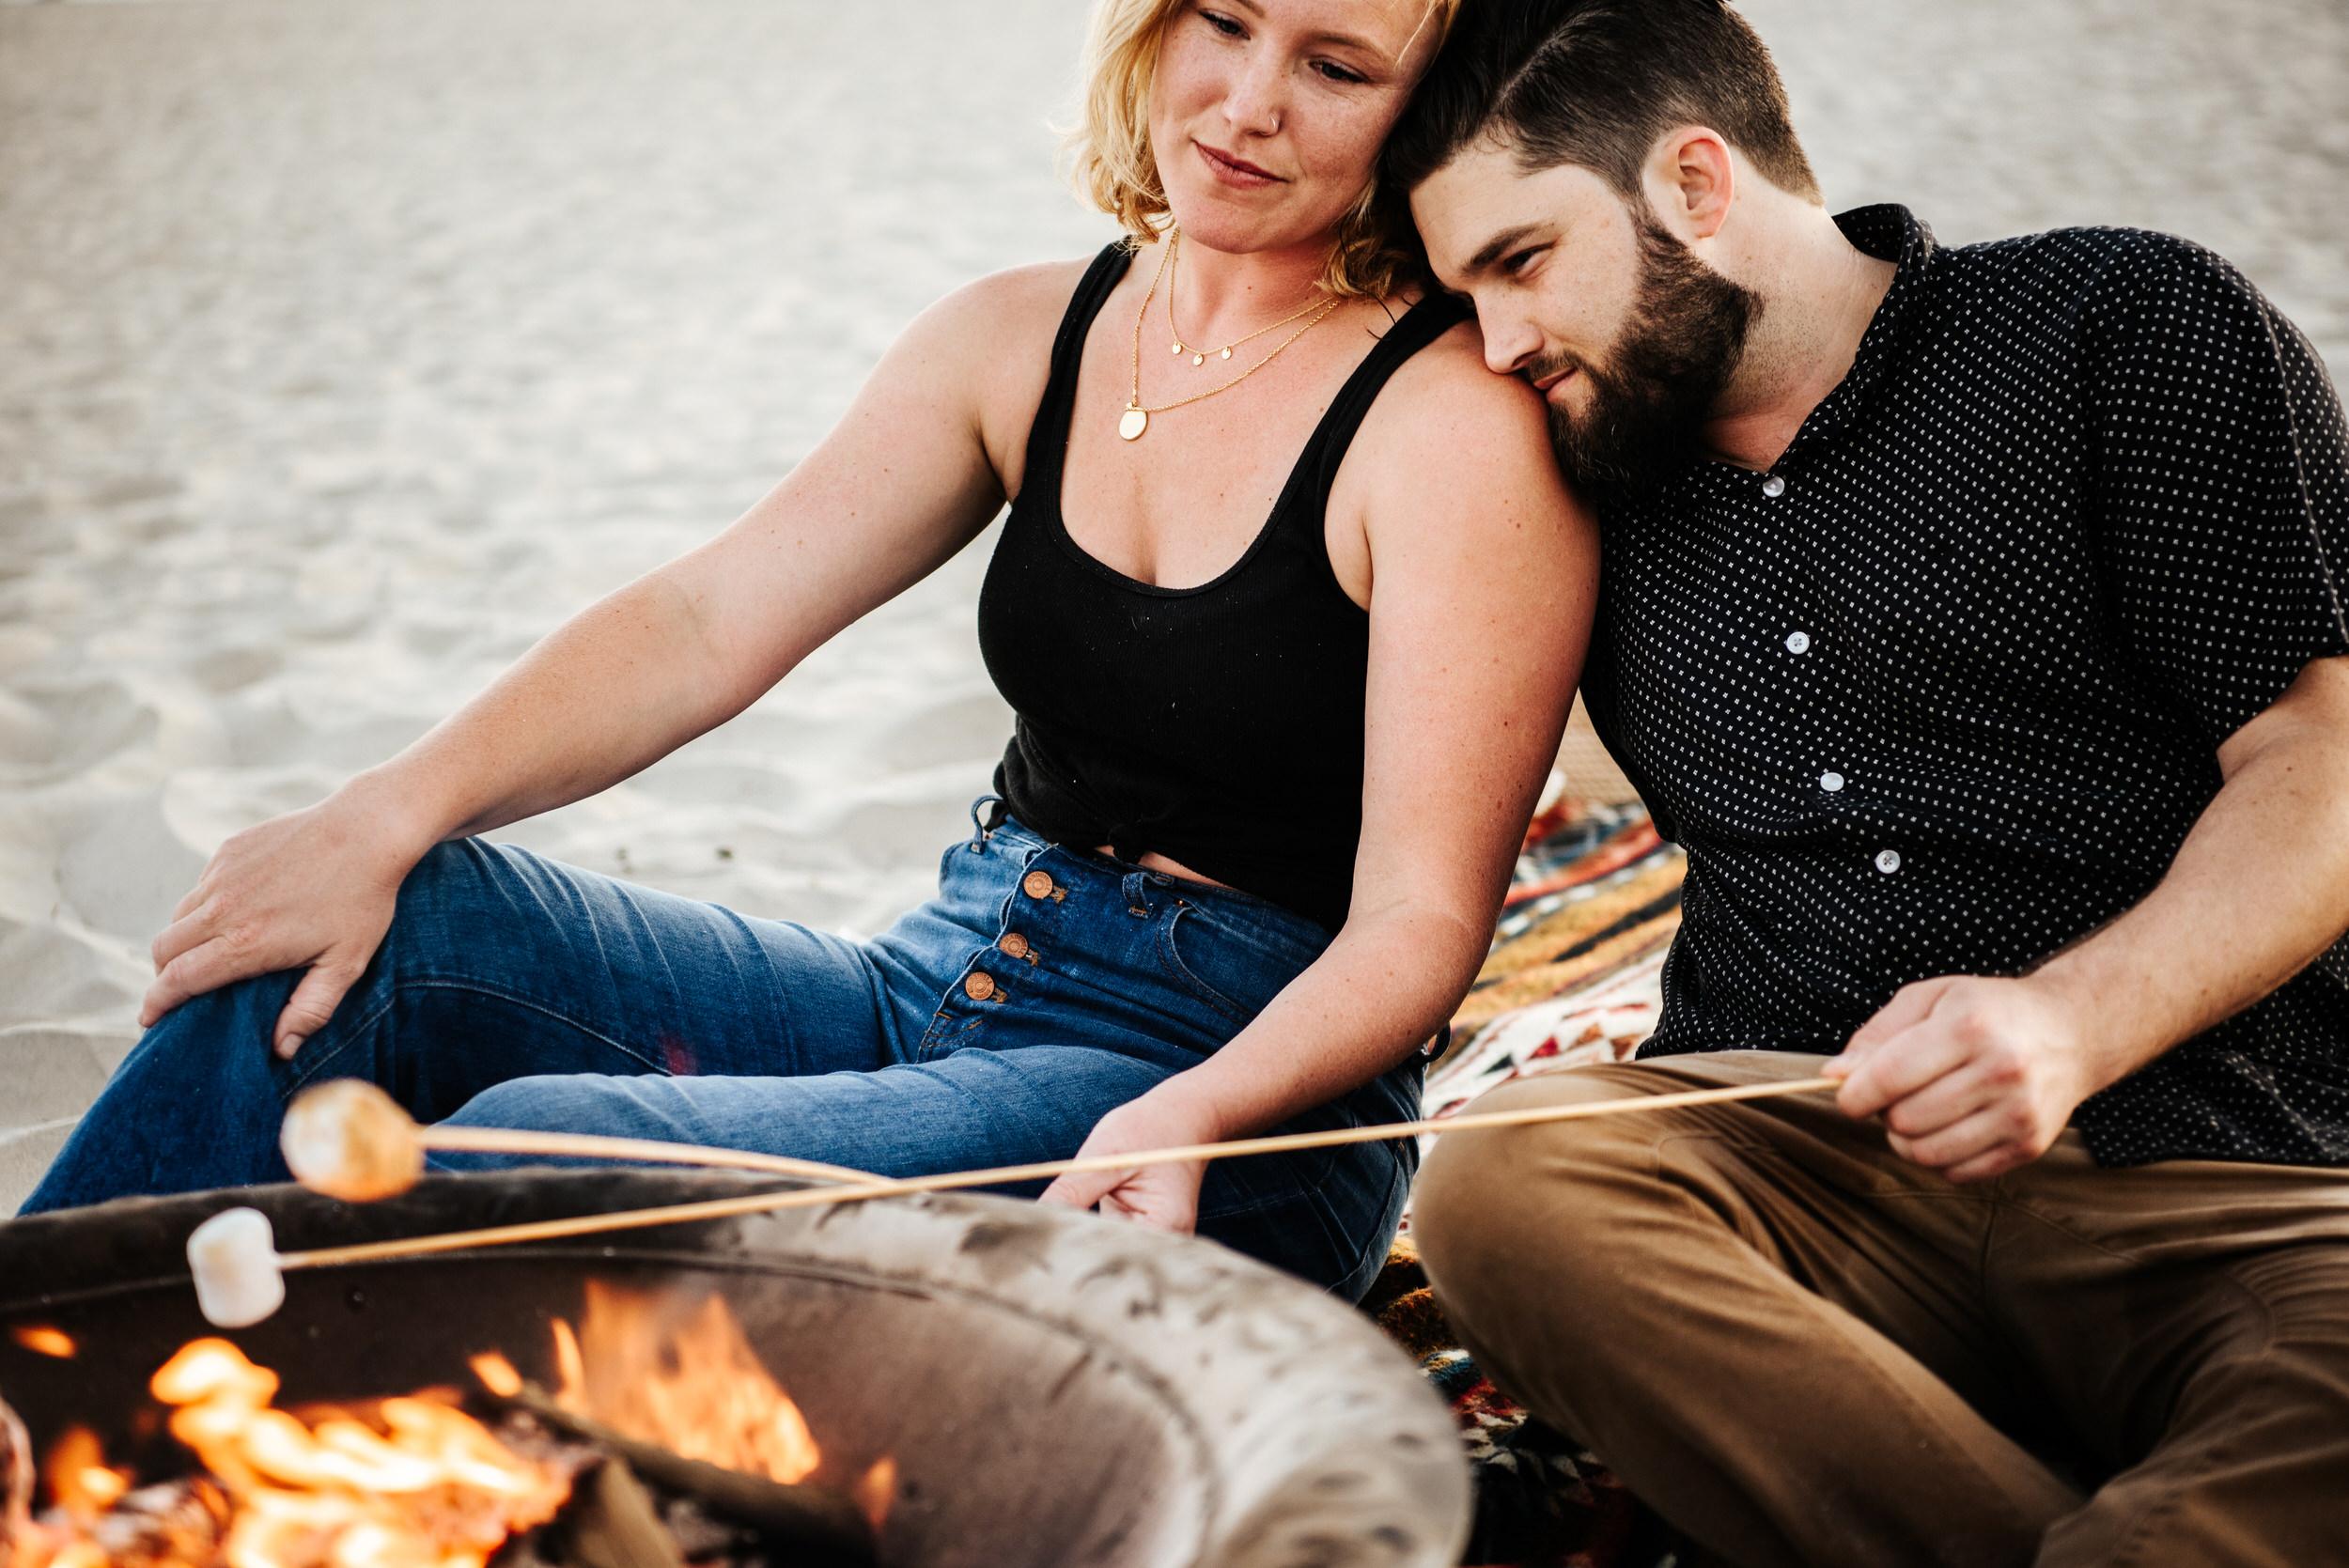 SoCal Standard - San Diego Engagement Photographer - Beach Bonfire at the Hotel Del Coronado-33.jpg